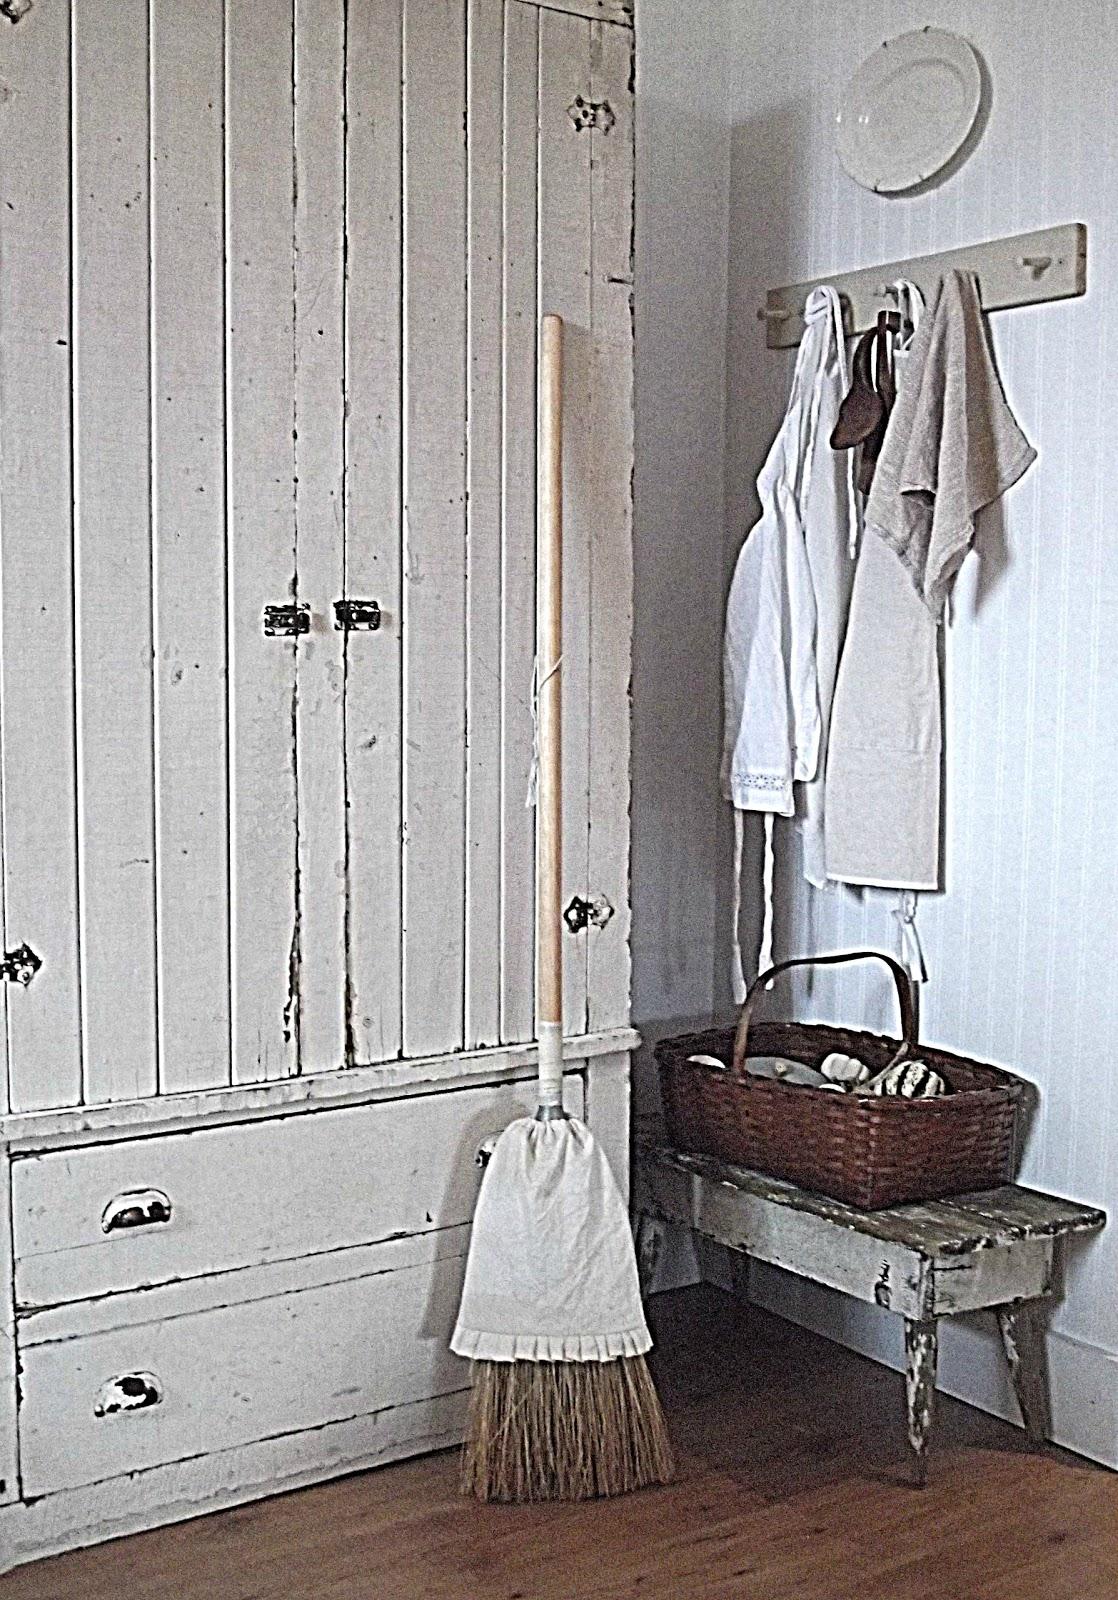 Rustic Farmhouse: Farmhouse Kitchen on Rustic Farmhouse Kitchen  id=54866